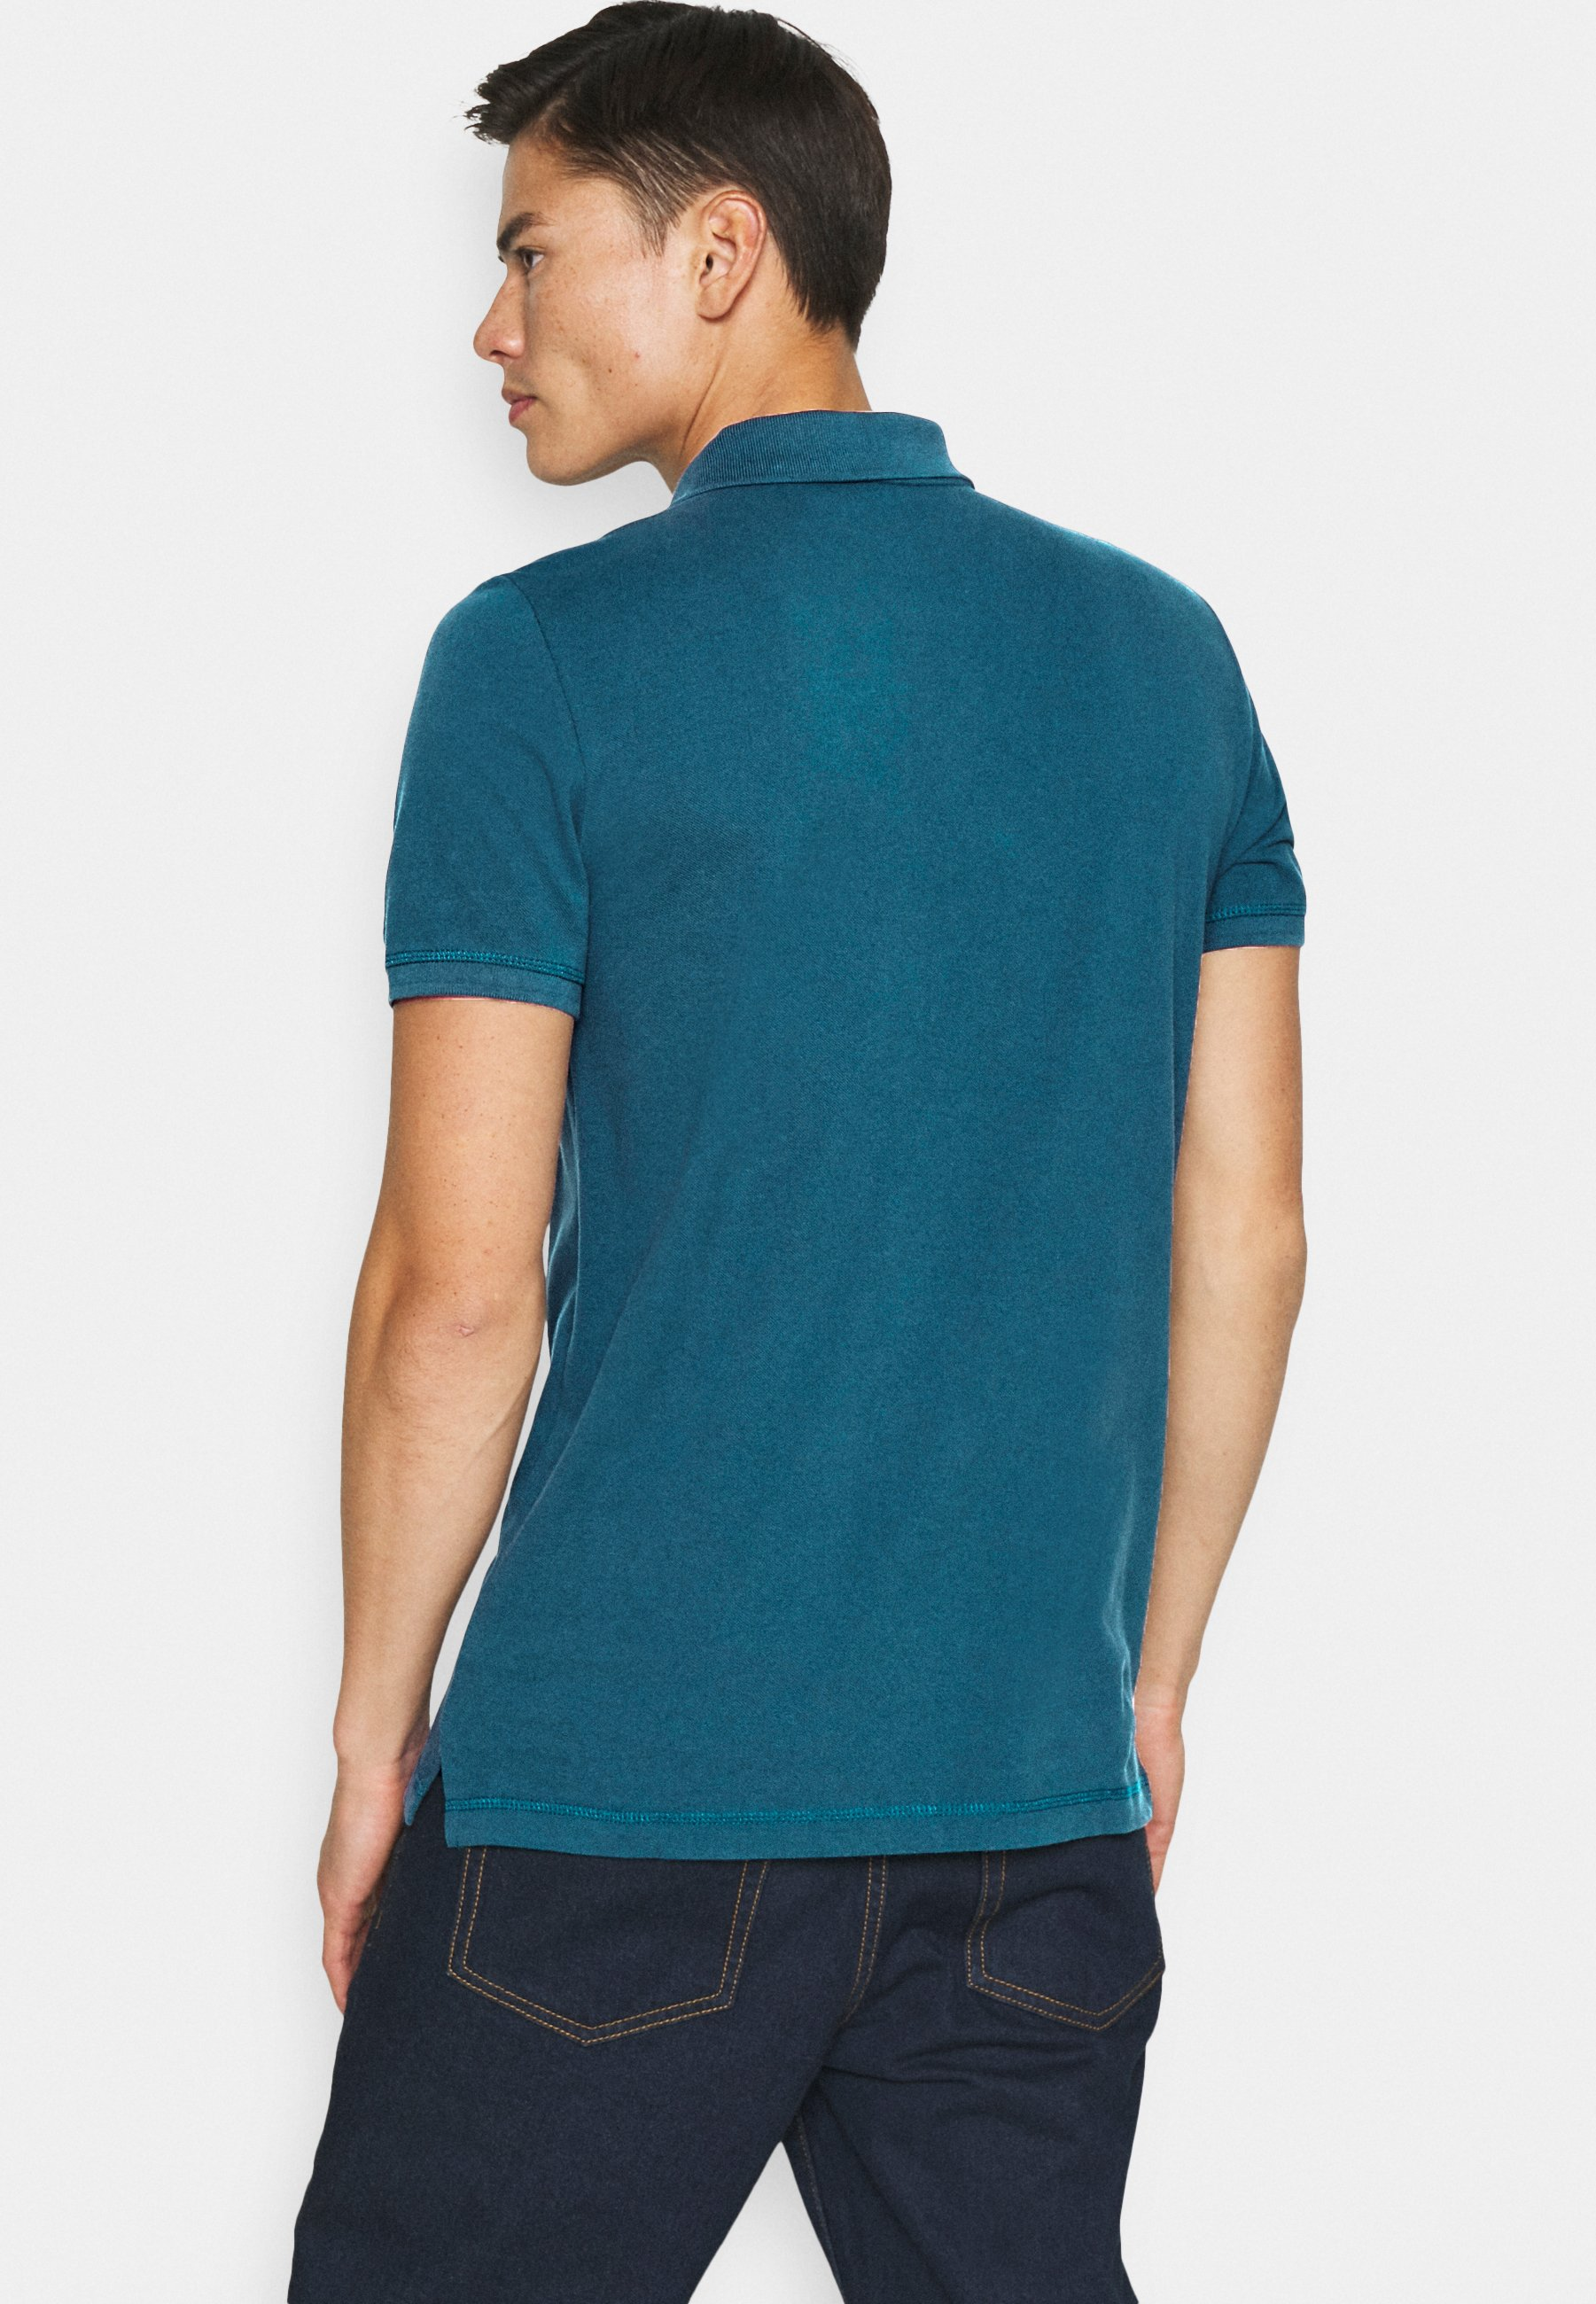 Mustang Polo shirt - blue 3z8st